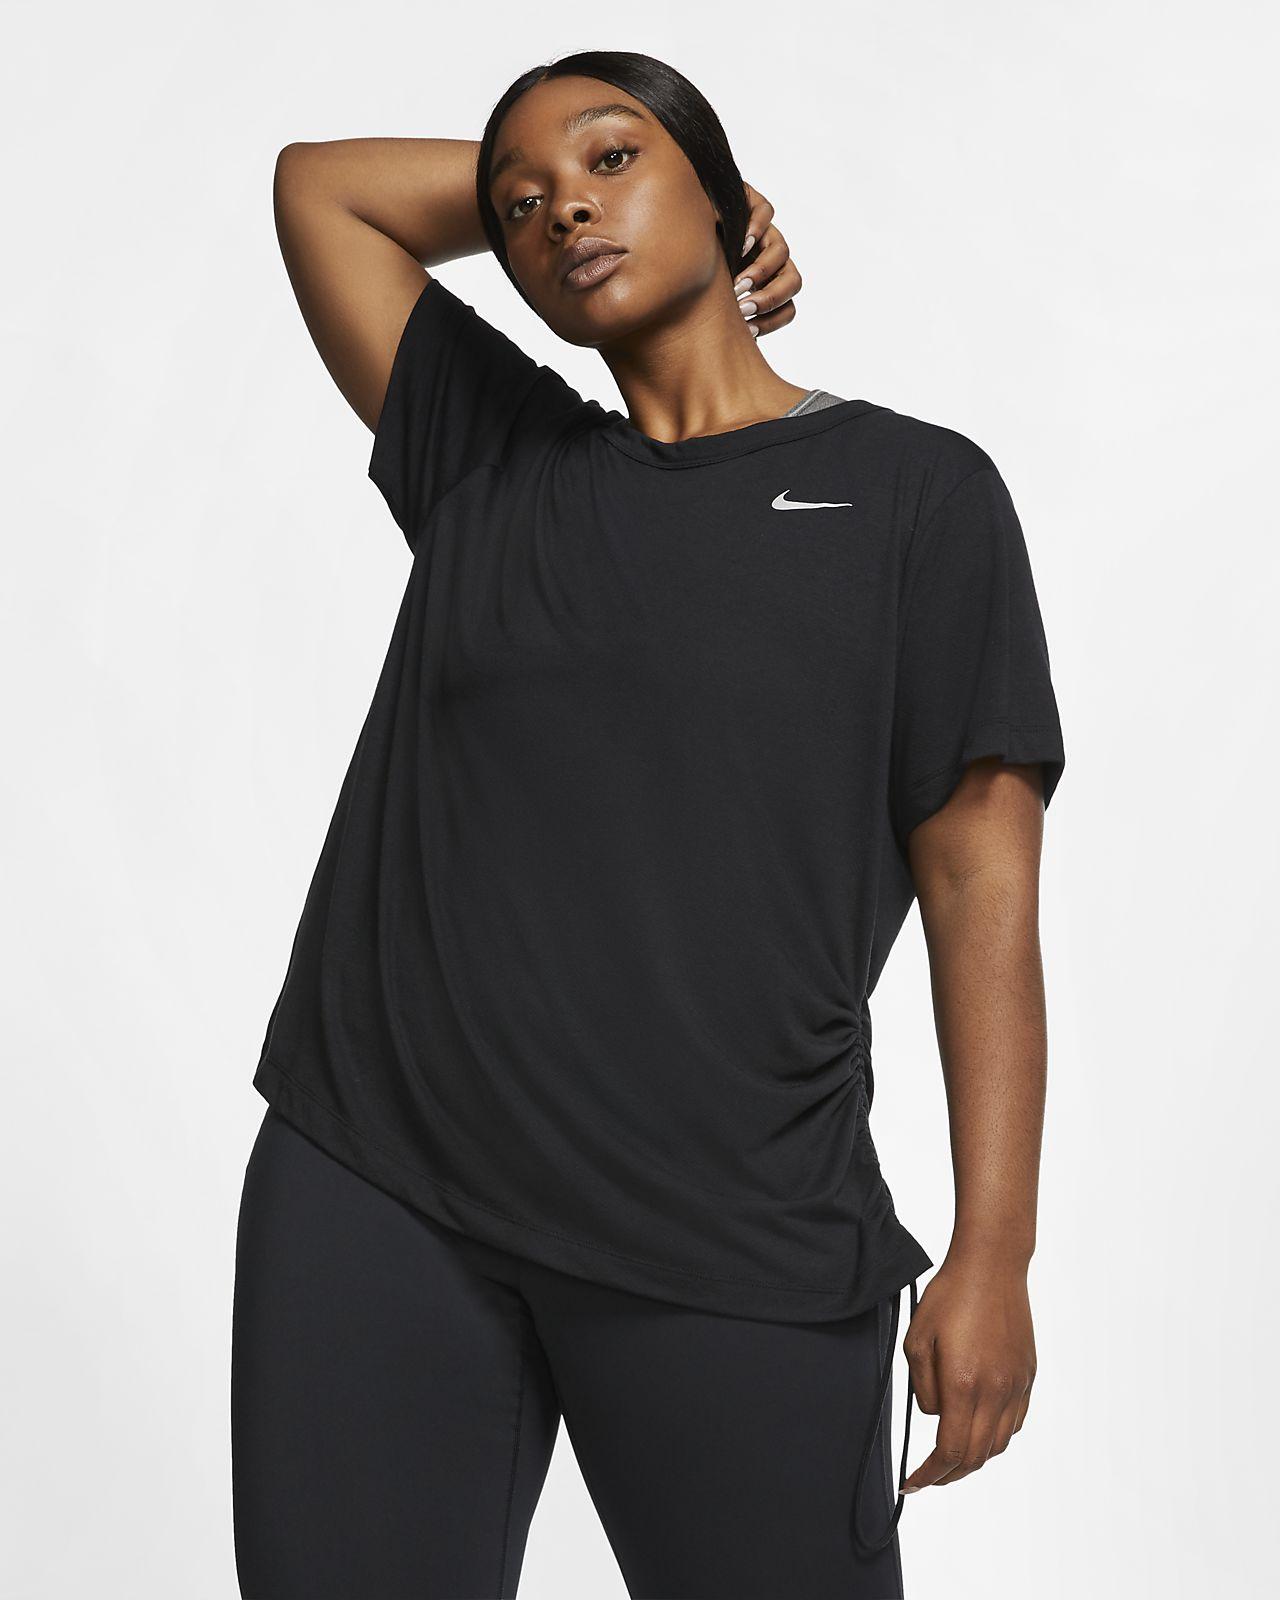 Prenda para la parte superior de running de manga corta para mujer Nike Miler (talla grande)